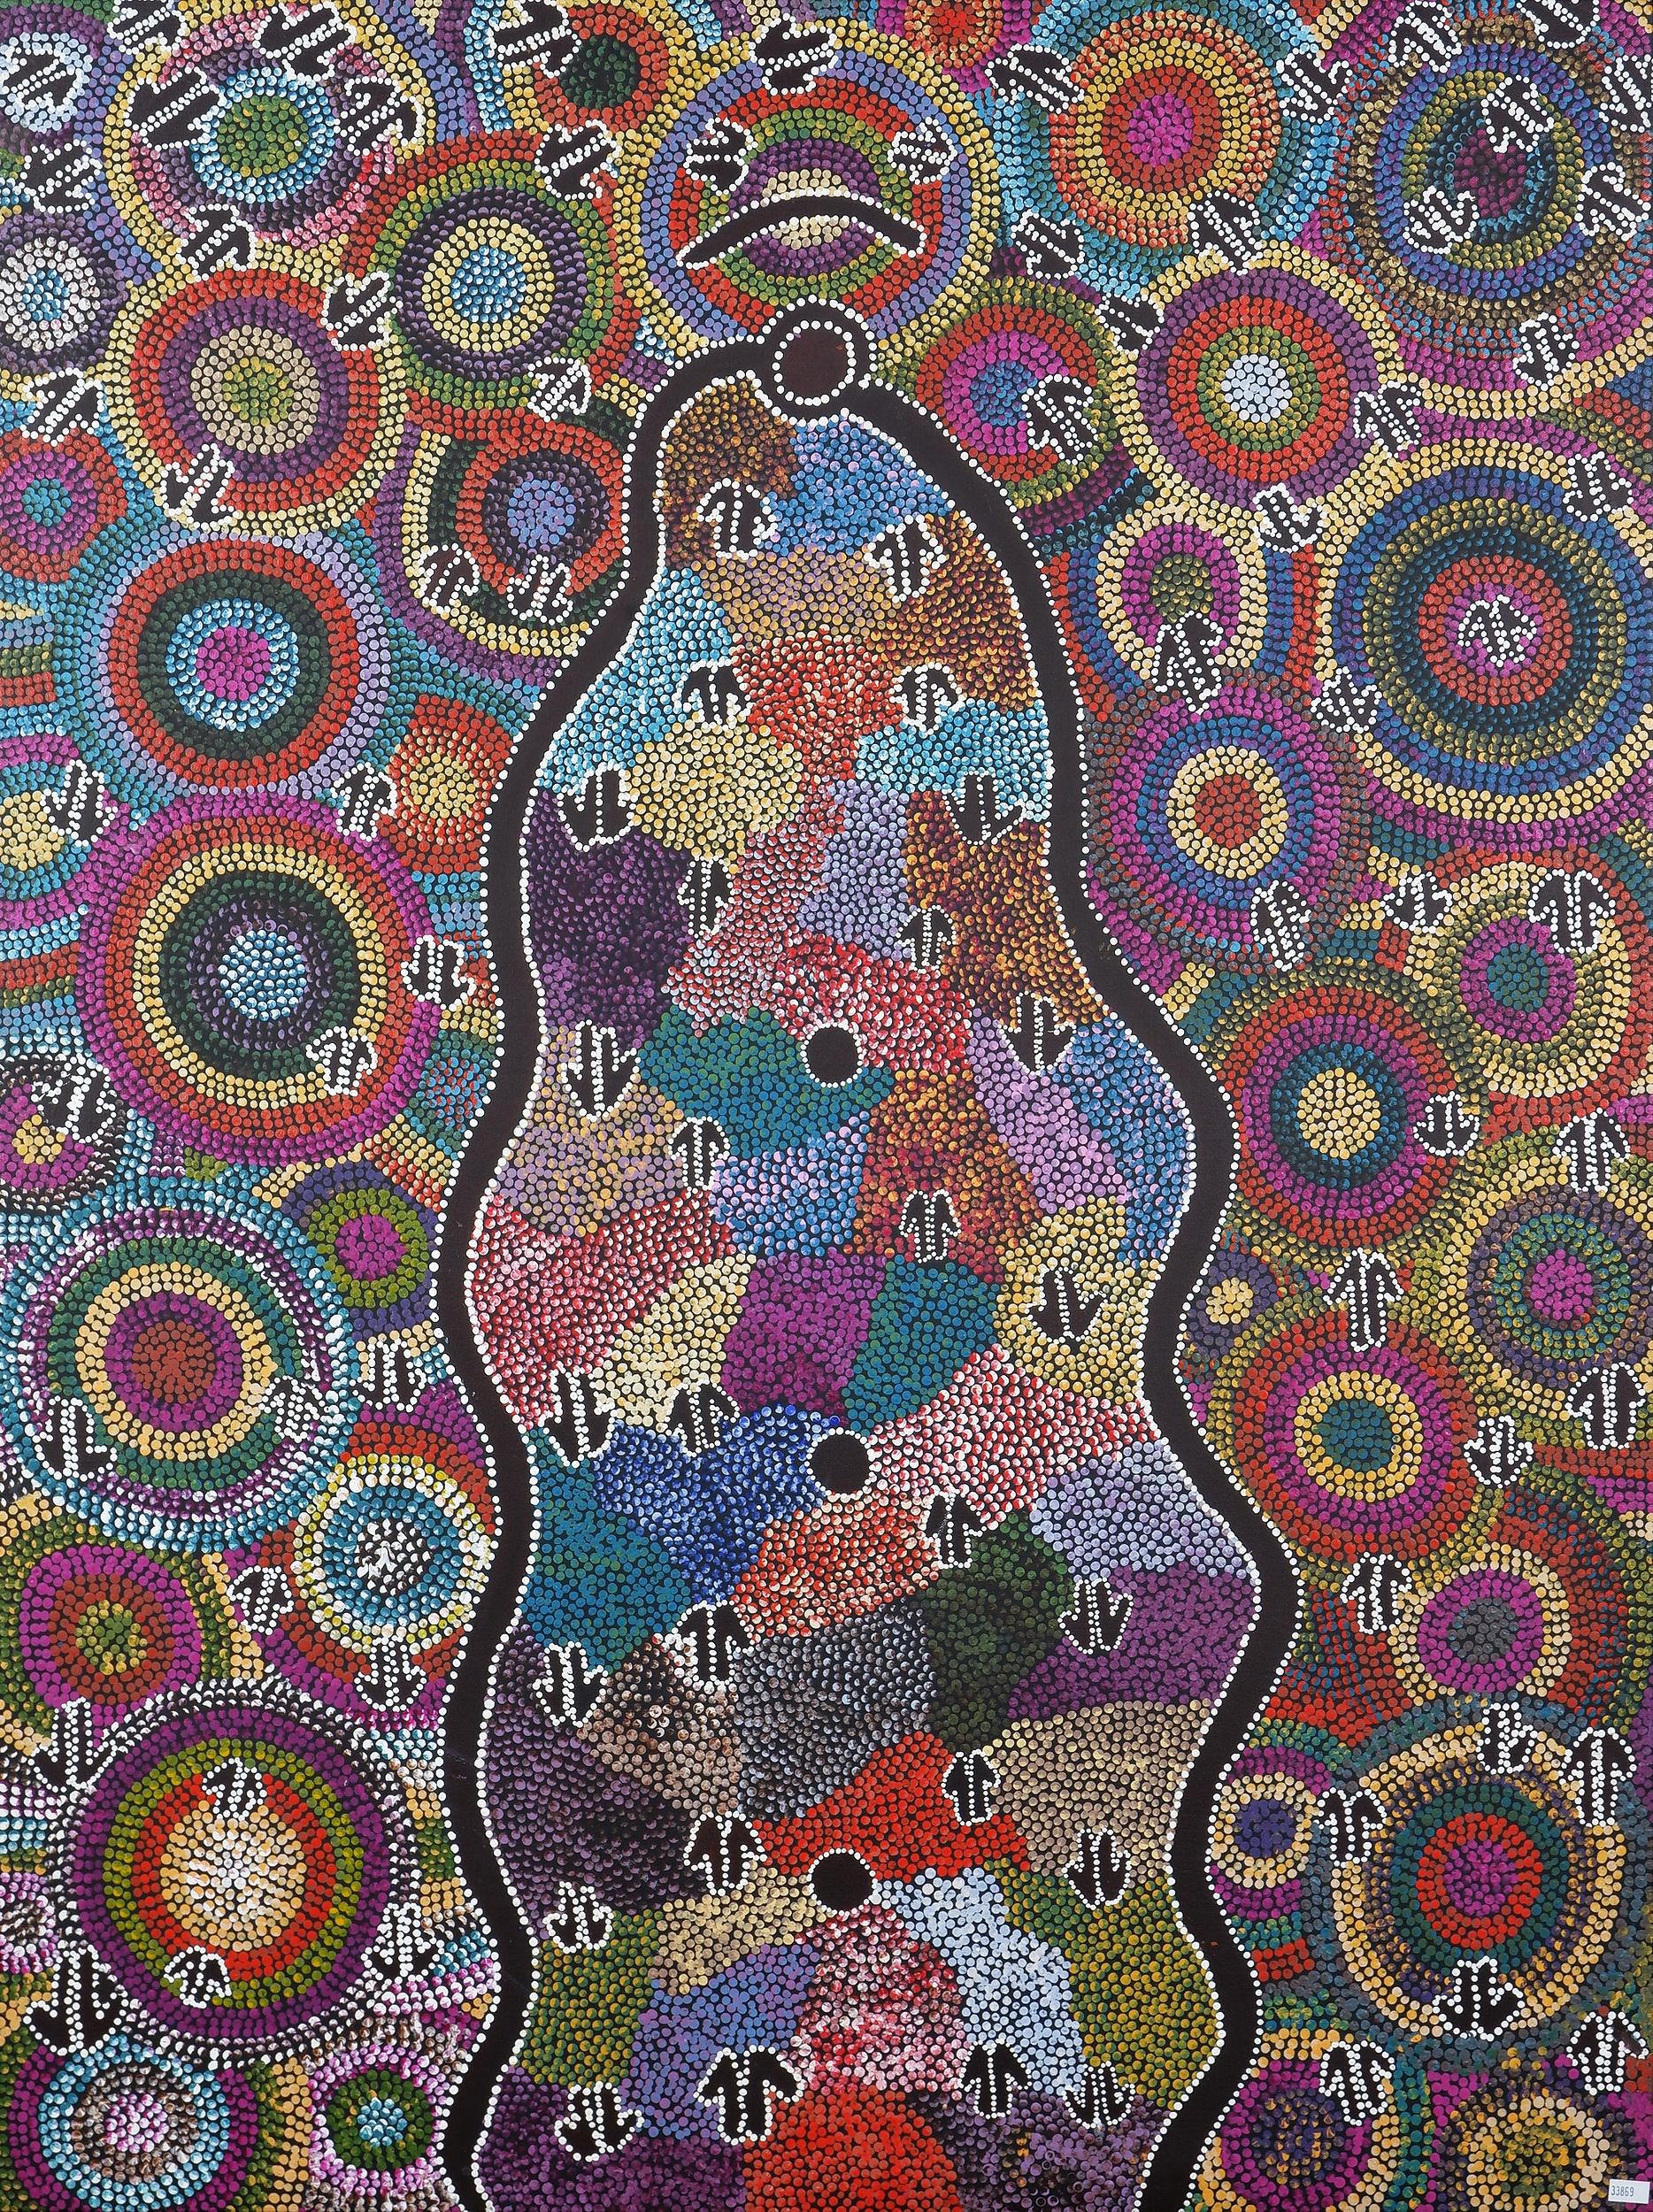 'Rachael Jurra Napaltjarri (born 1961, Warlpiri language group), Malu Dreaming 1994, Acrylic on Canvas'